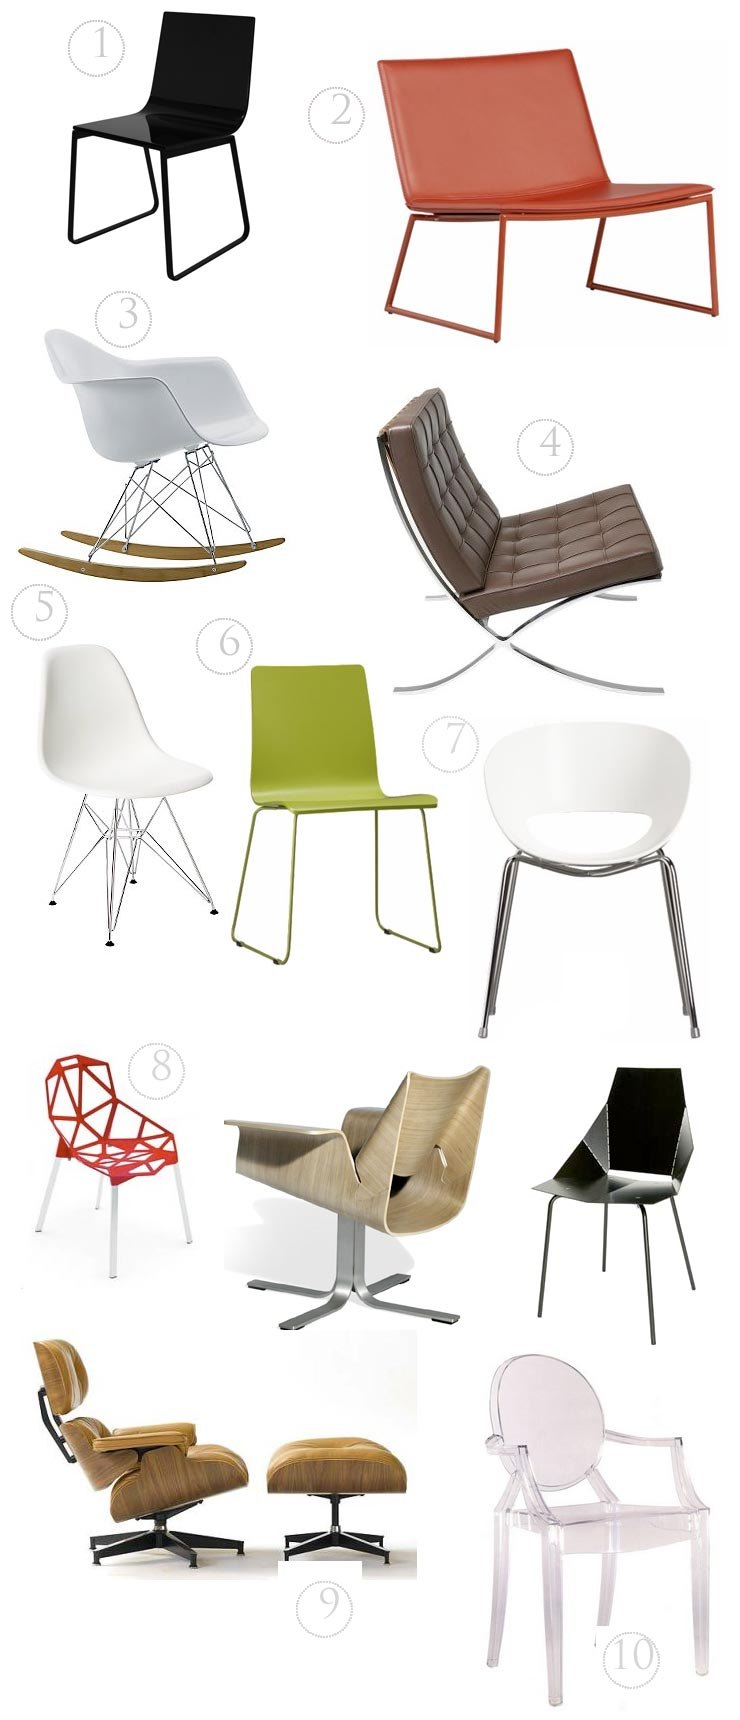 Top 10 dizajnerskih stolica